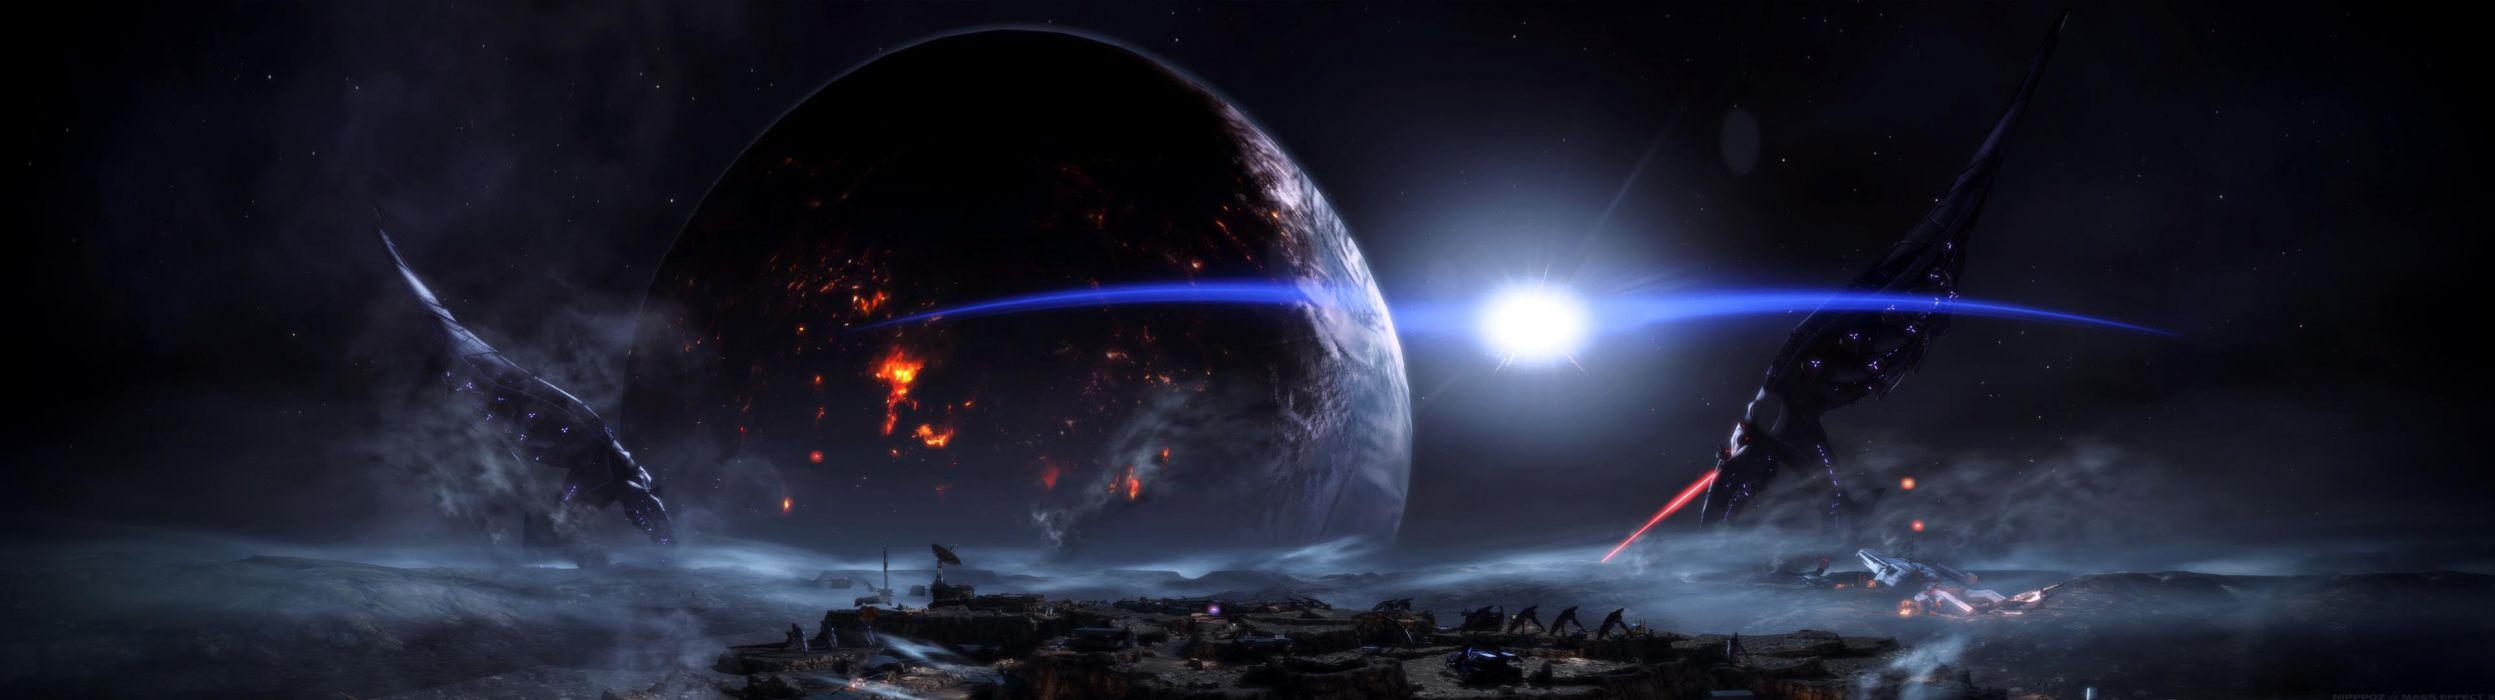 GALACTIC-CIVILIZATIONS sci-fi spaceship galactic civilizations (1) wallpaper